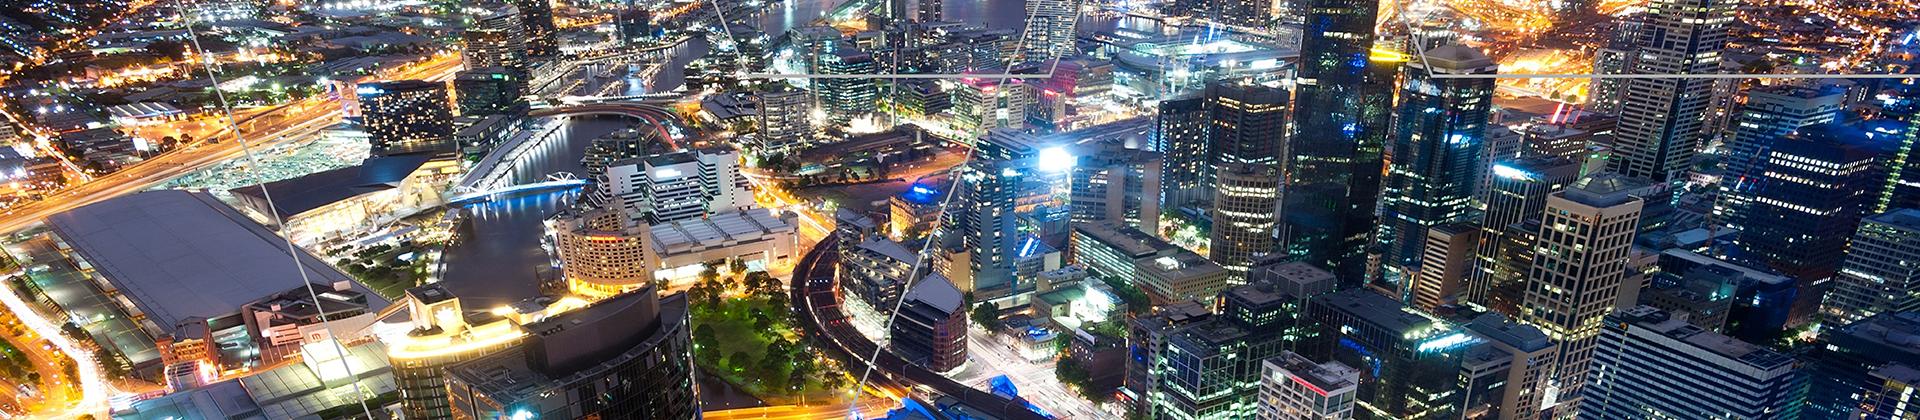 Webinar-The energy market is changing-web header